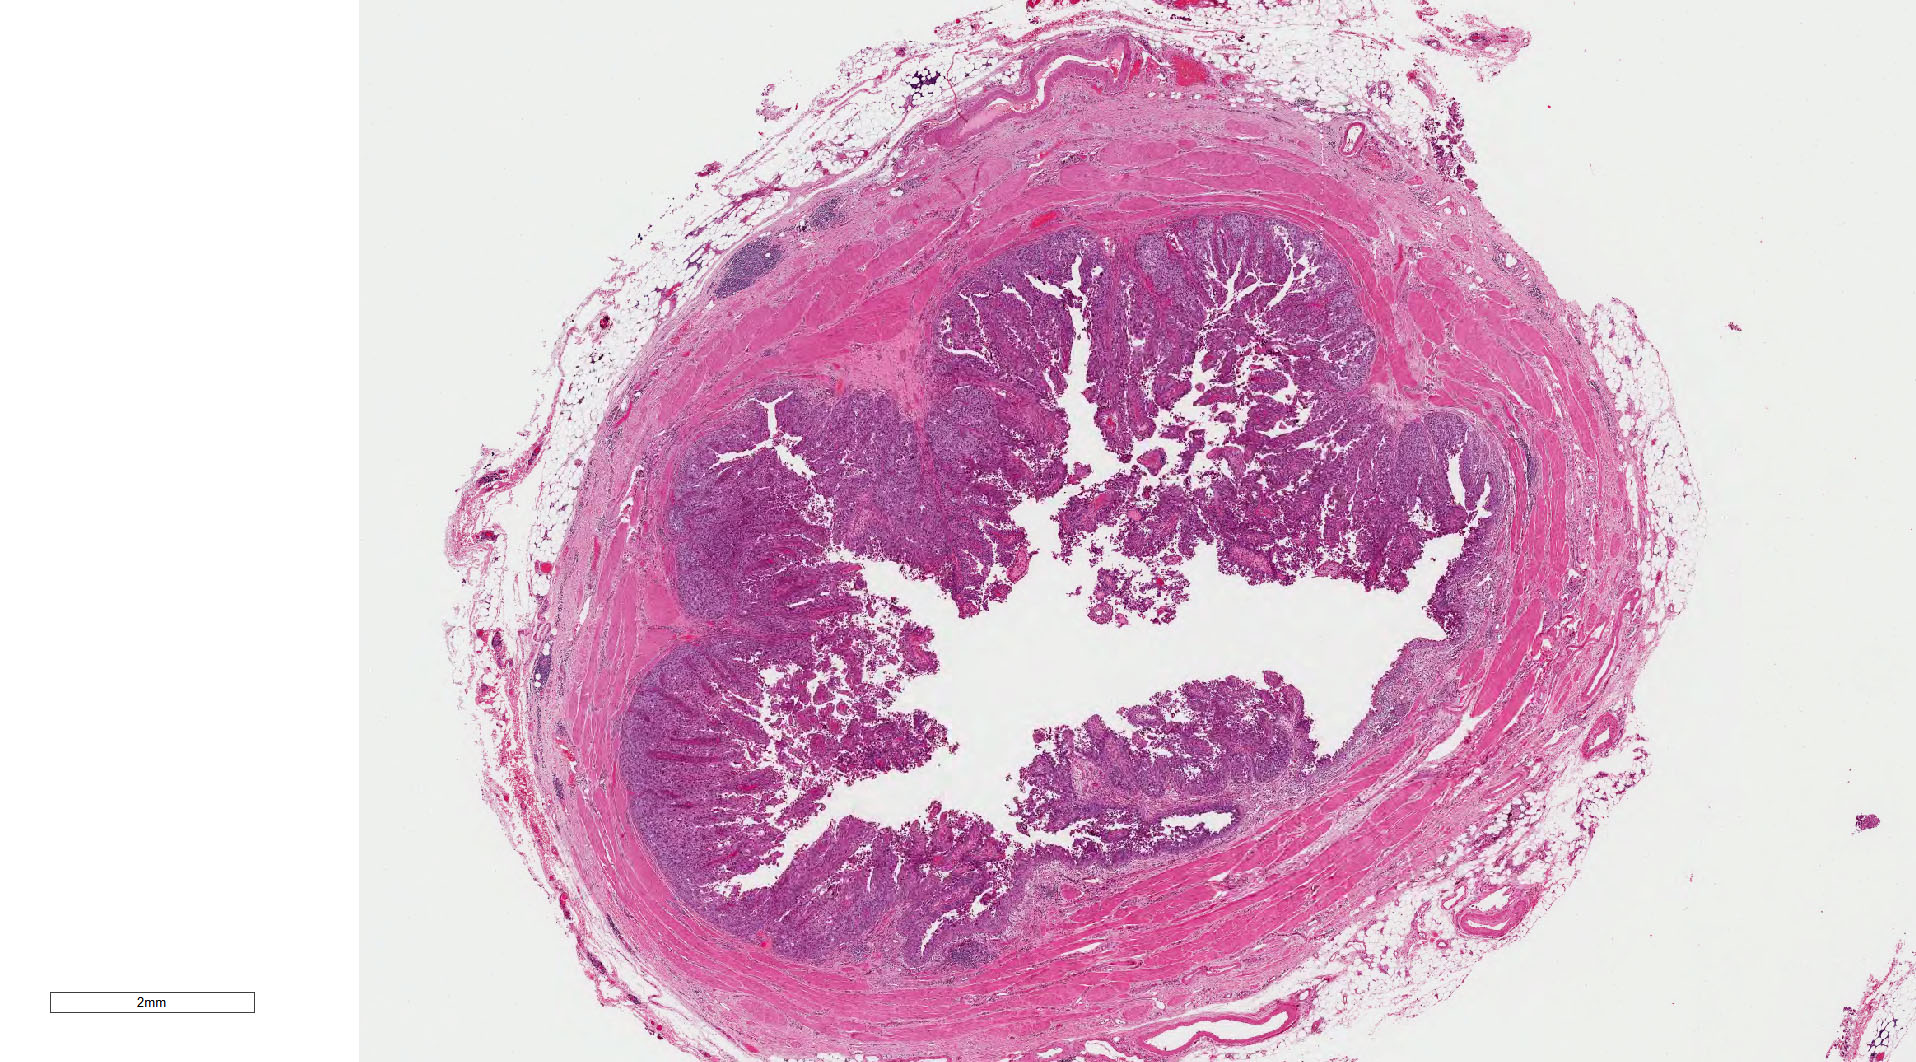 Cross section of ureter